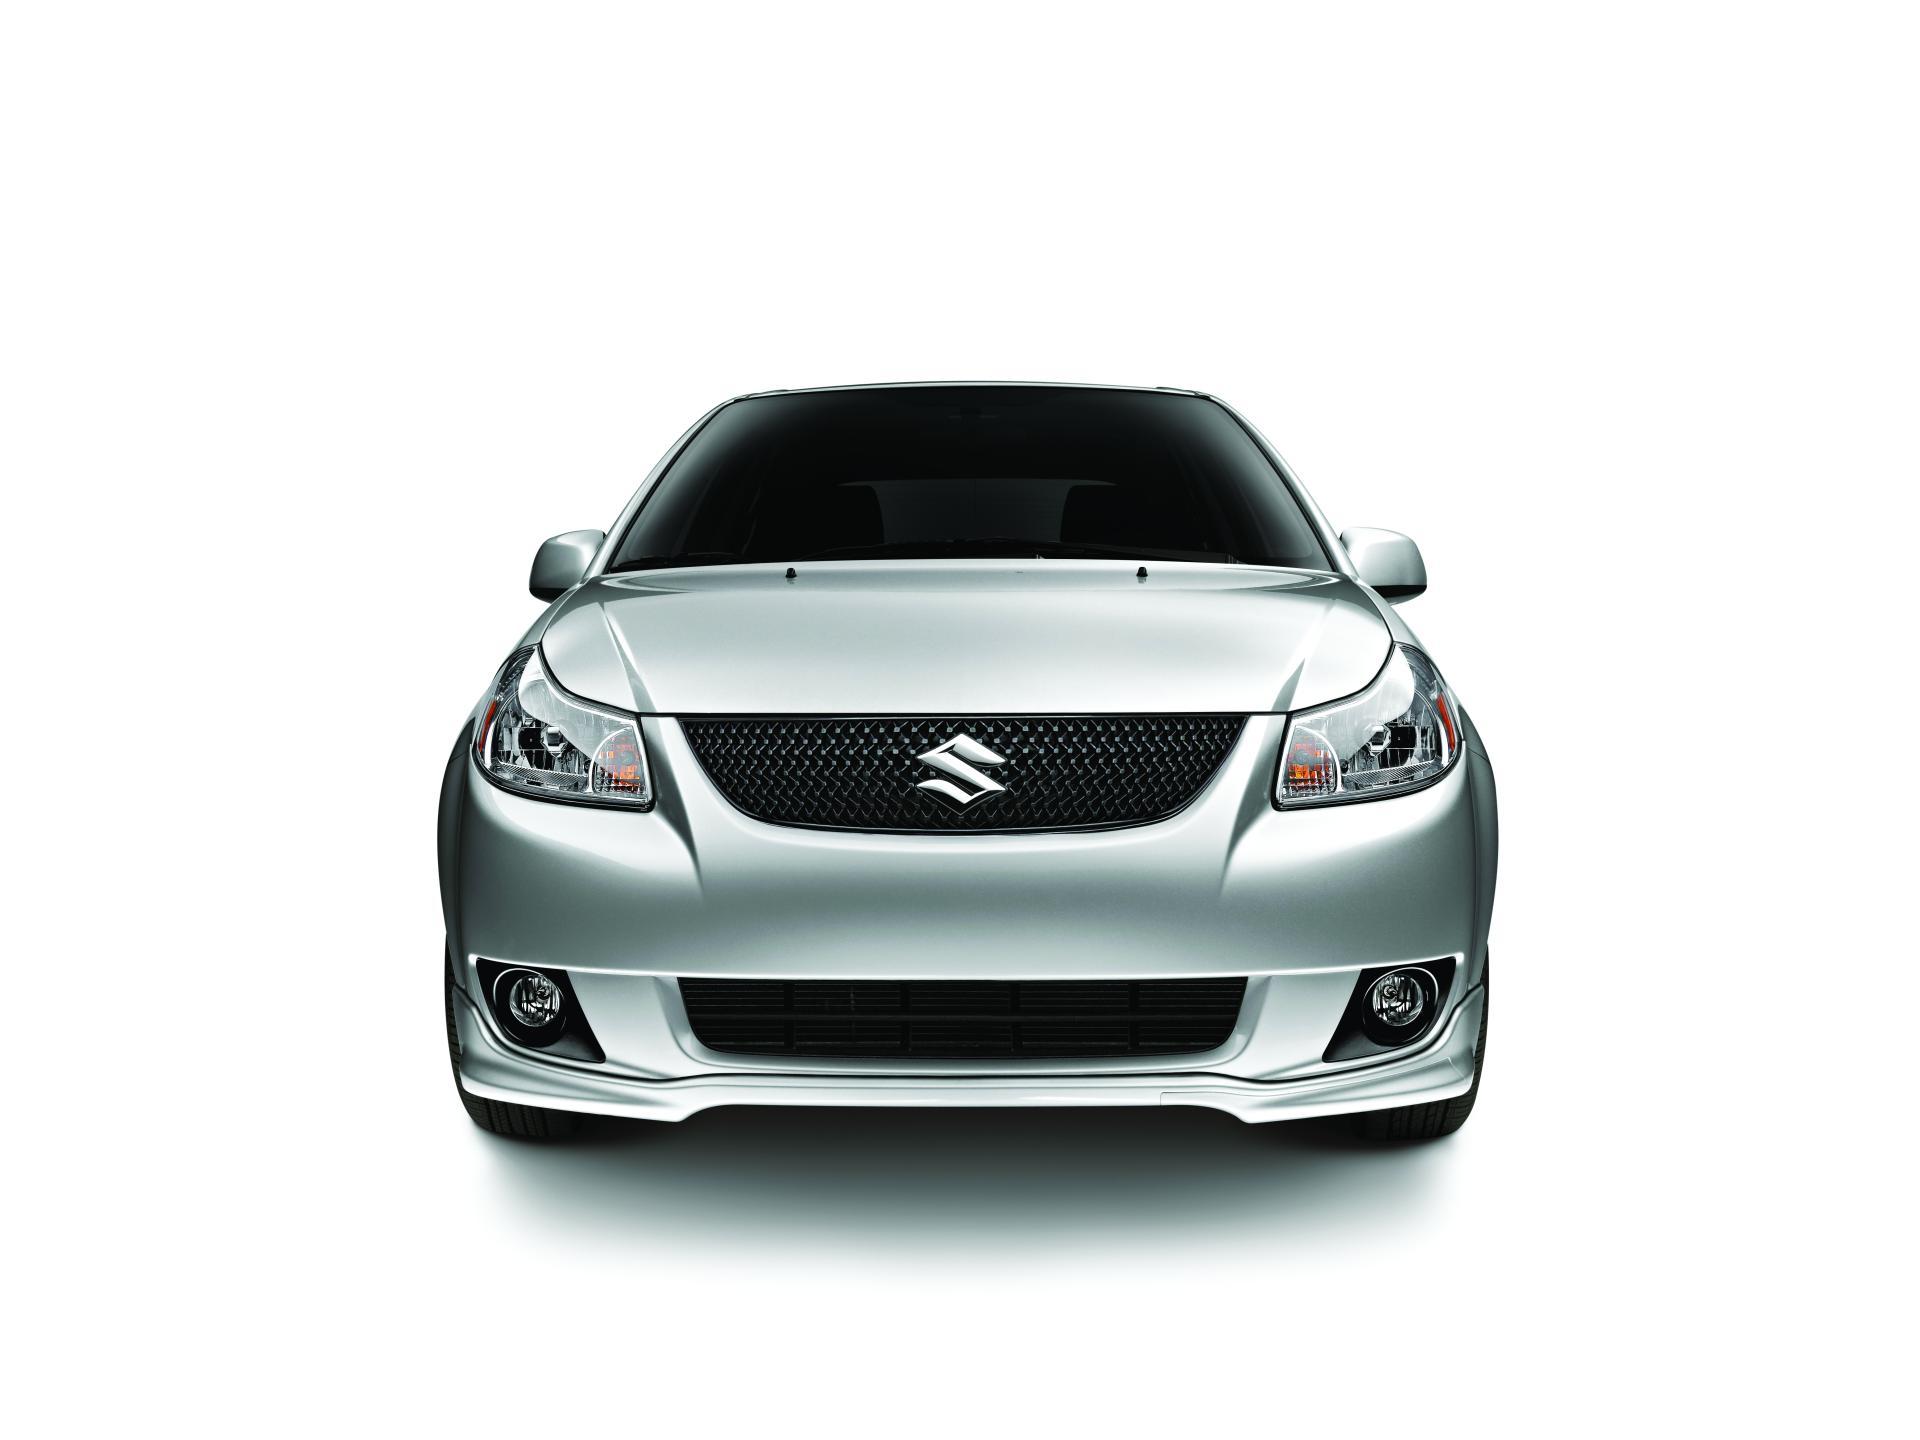 Dodge Muscle Car Wallpaper 2012 Suzuki Sx4 Sedan News And Information Conceptcarz Com